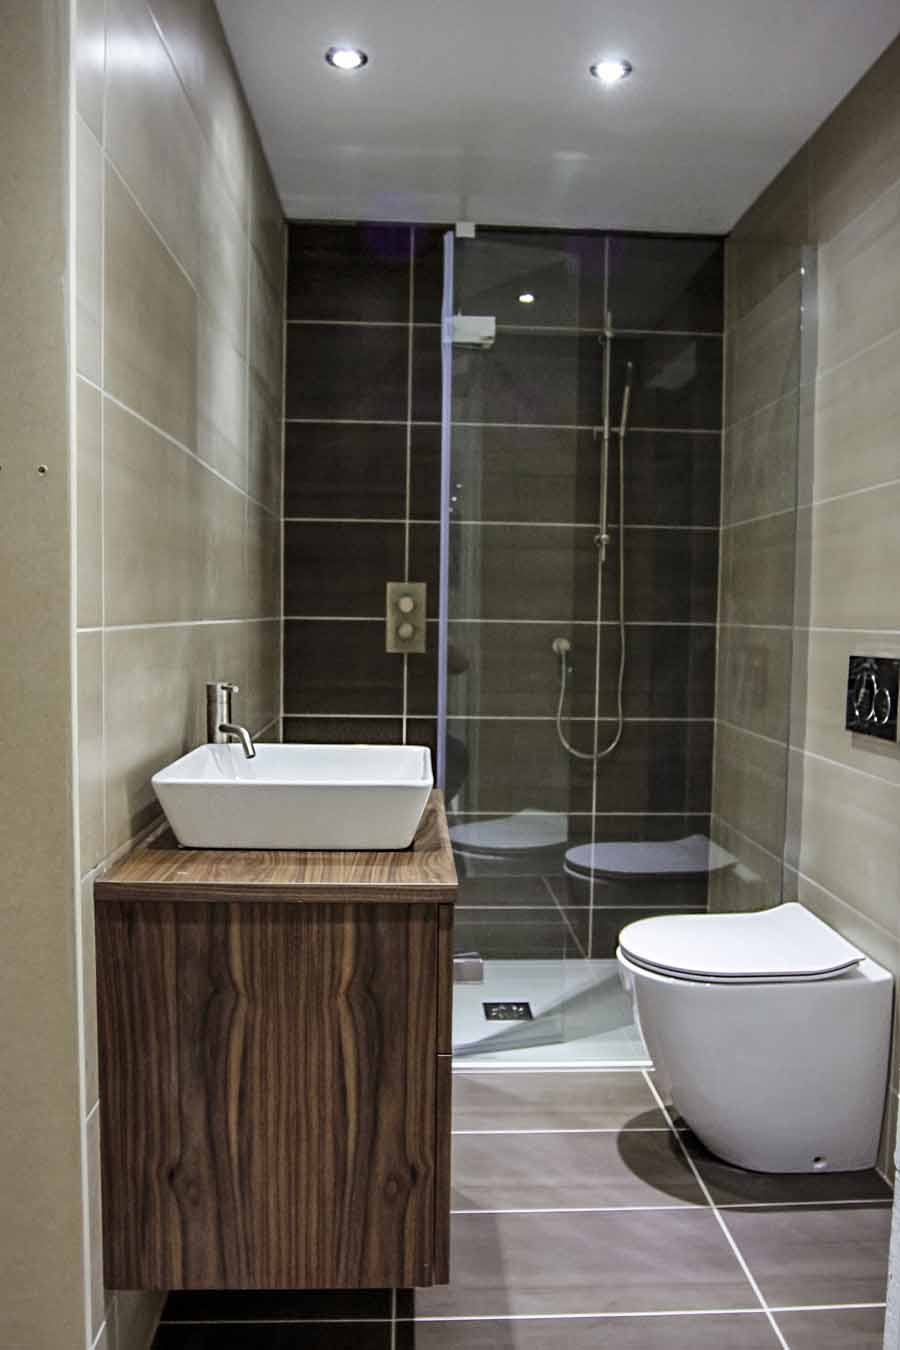 Tiny Shower Room Ideas Uk Small Shower Room Ideas ...